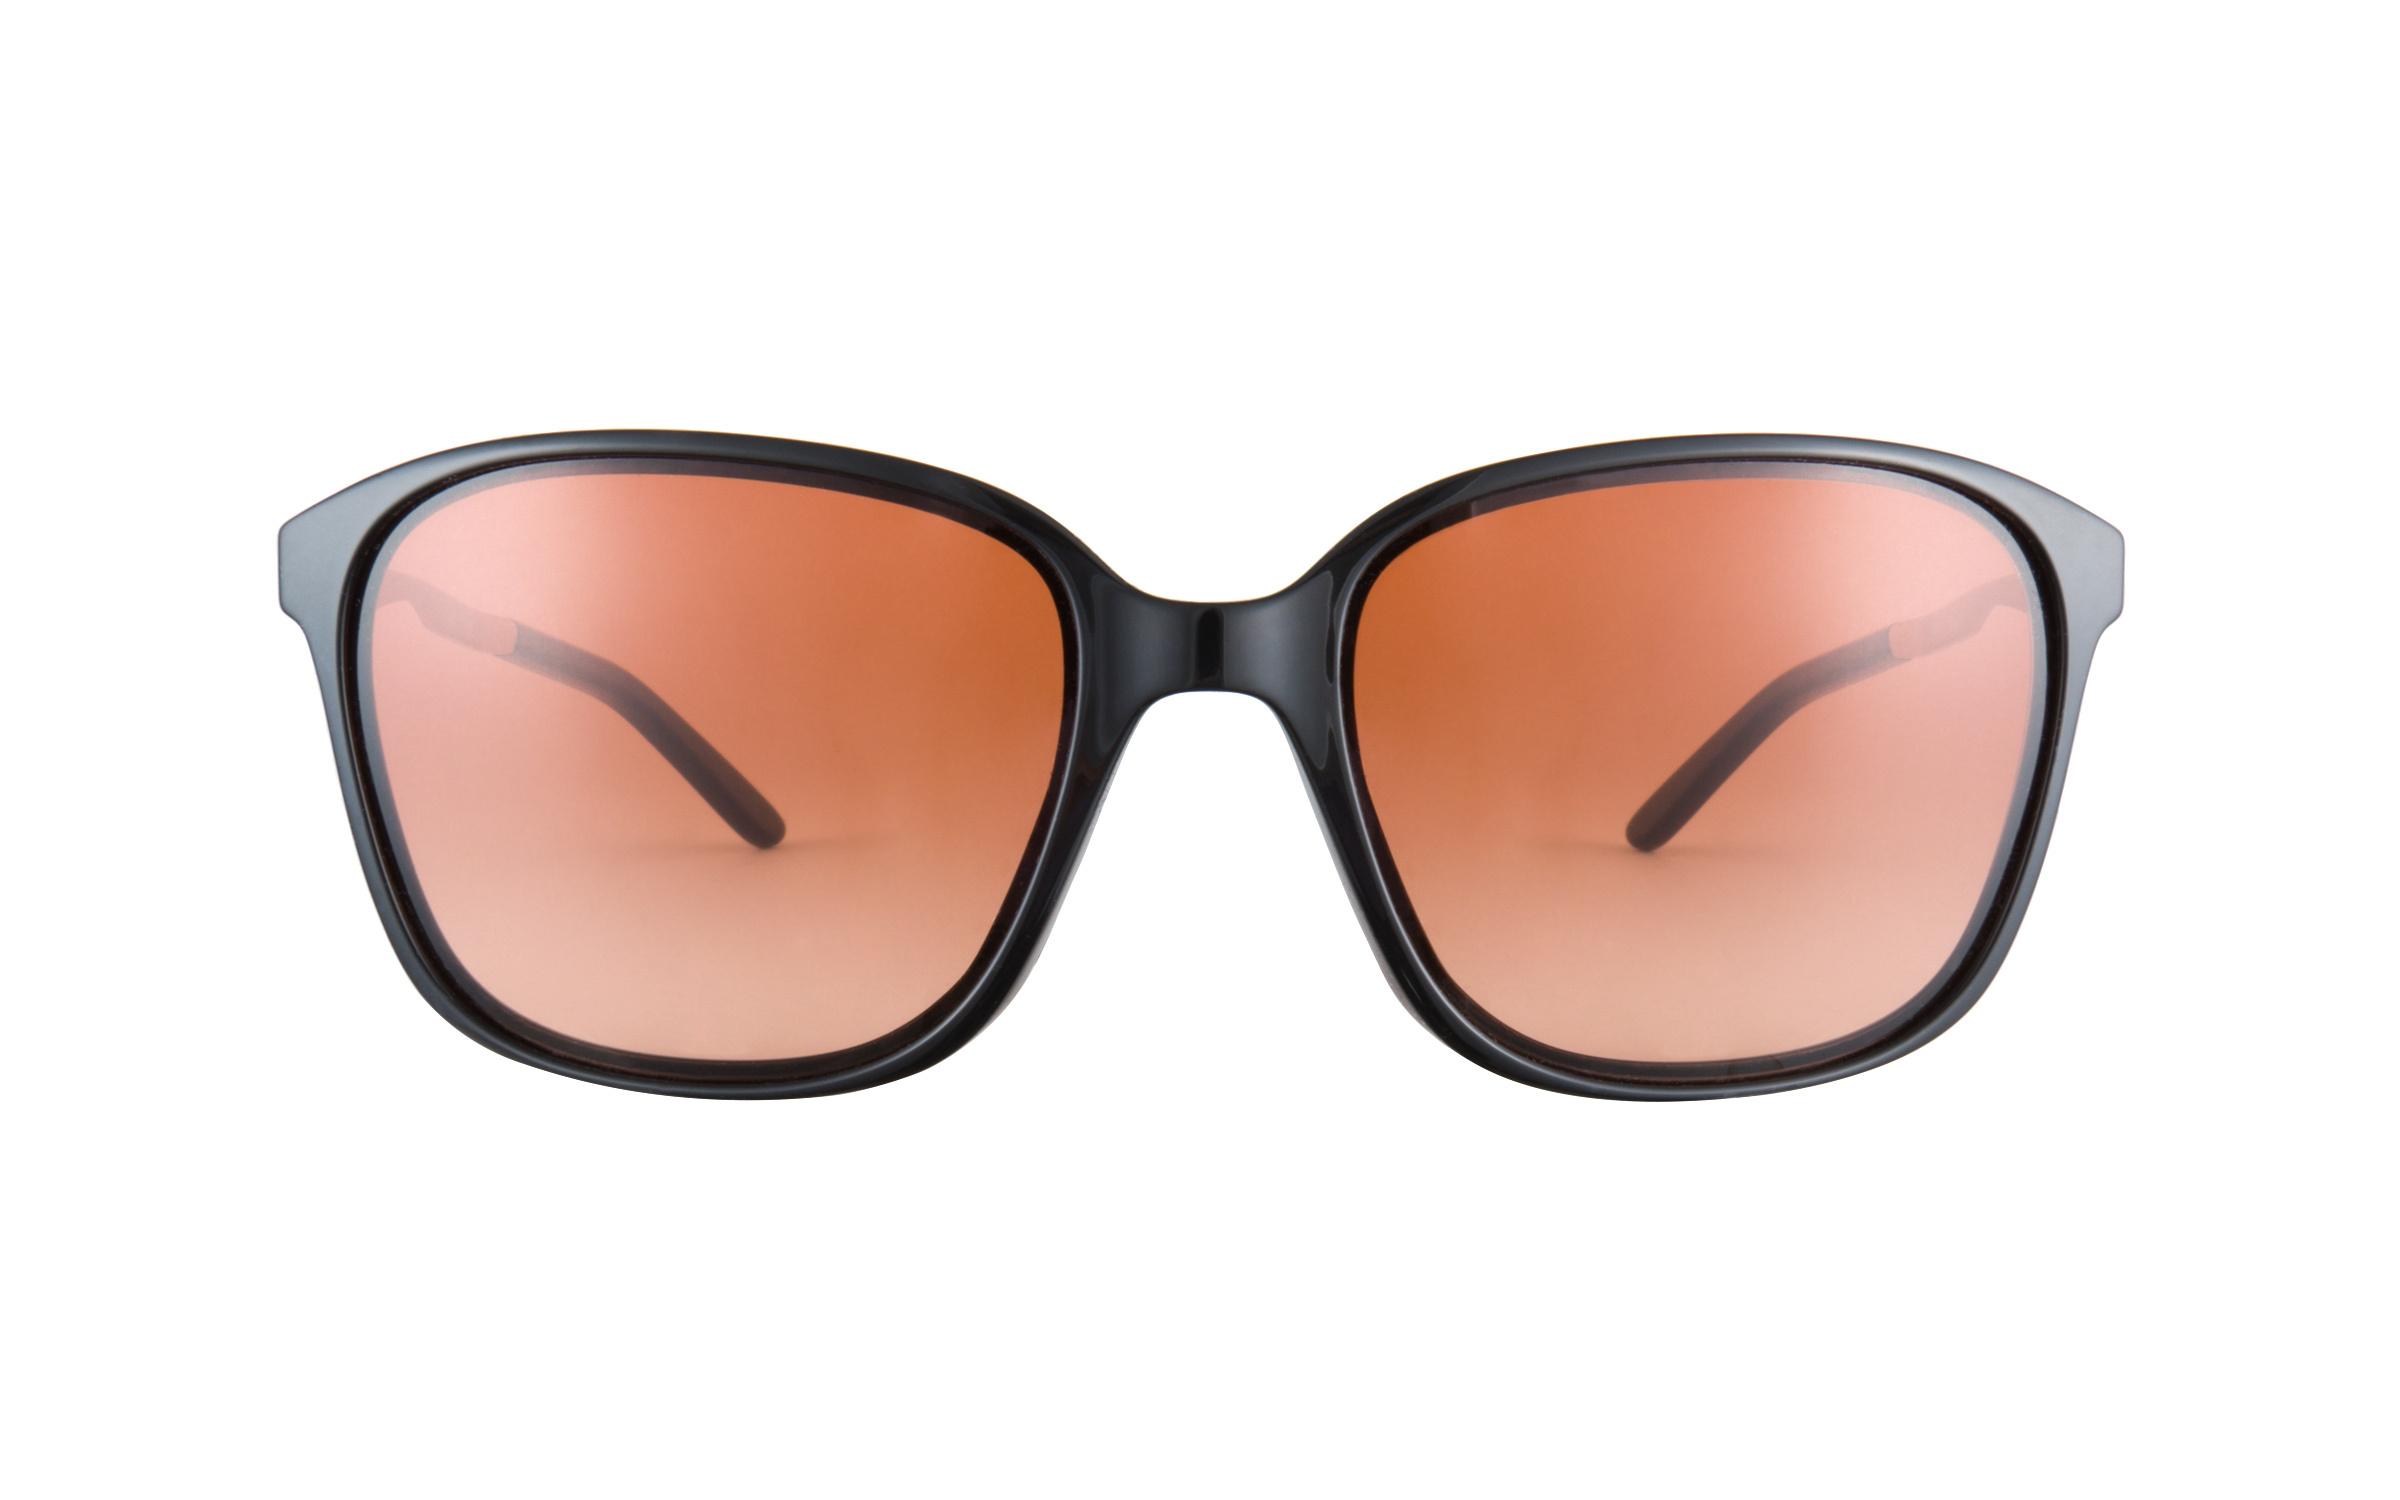 Oakley Game Changer 9291 04 Blk Gold 58 Sunglasses